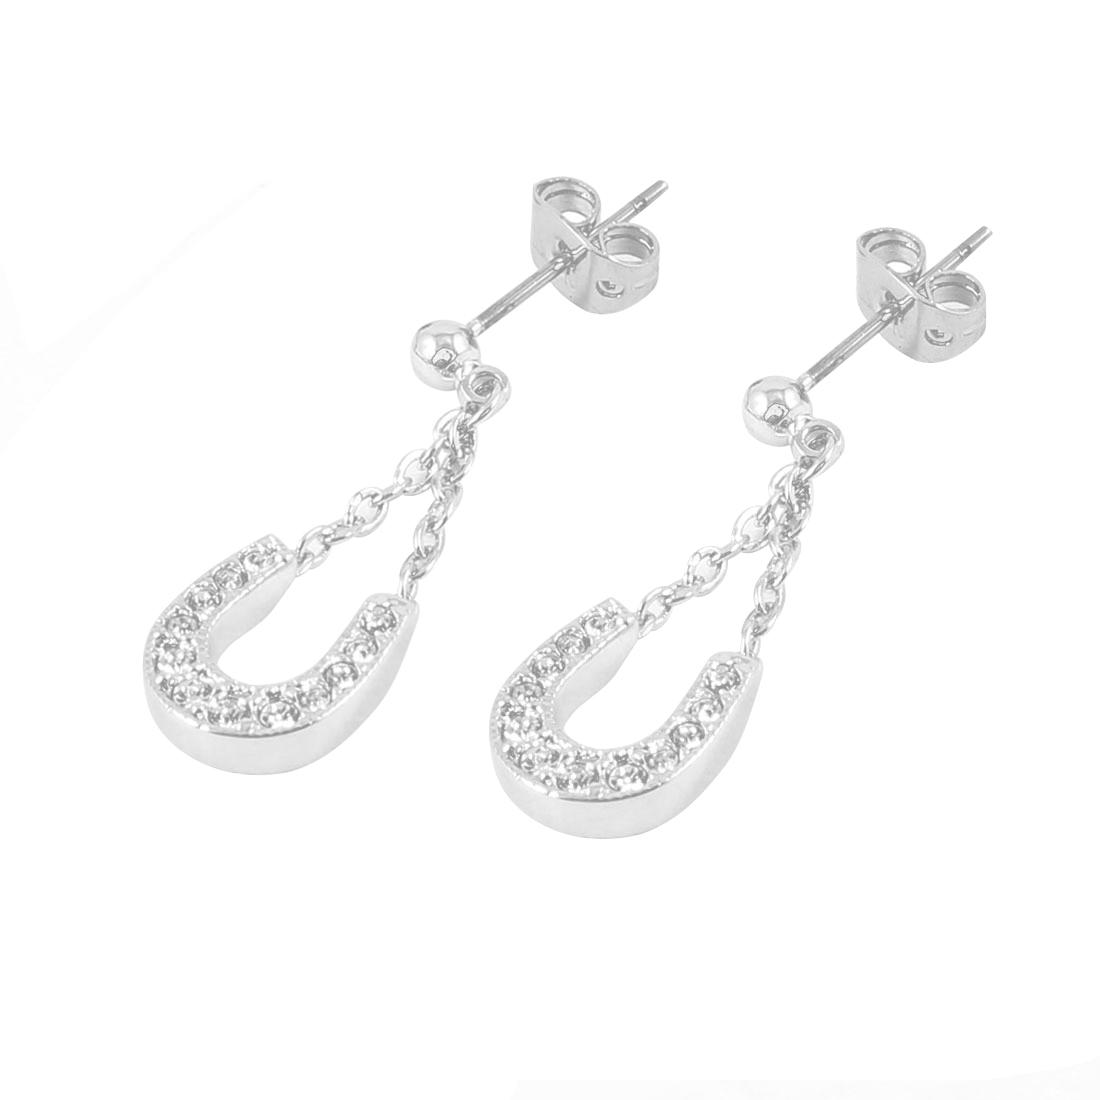 Pair Shiny Rhinestone Inlaid U Design Pendant Eardrop Earrings for Ladies